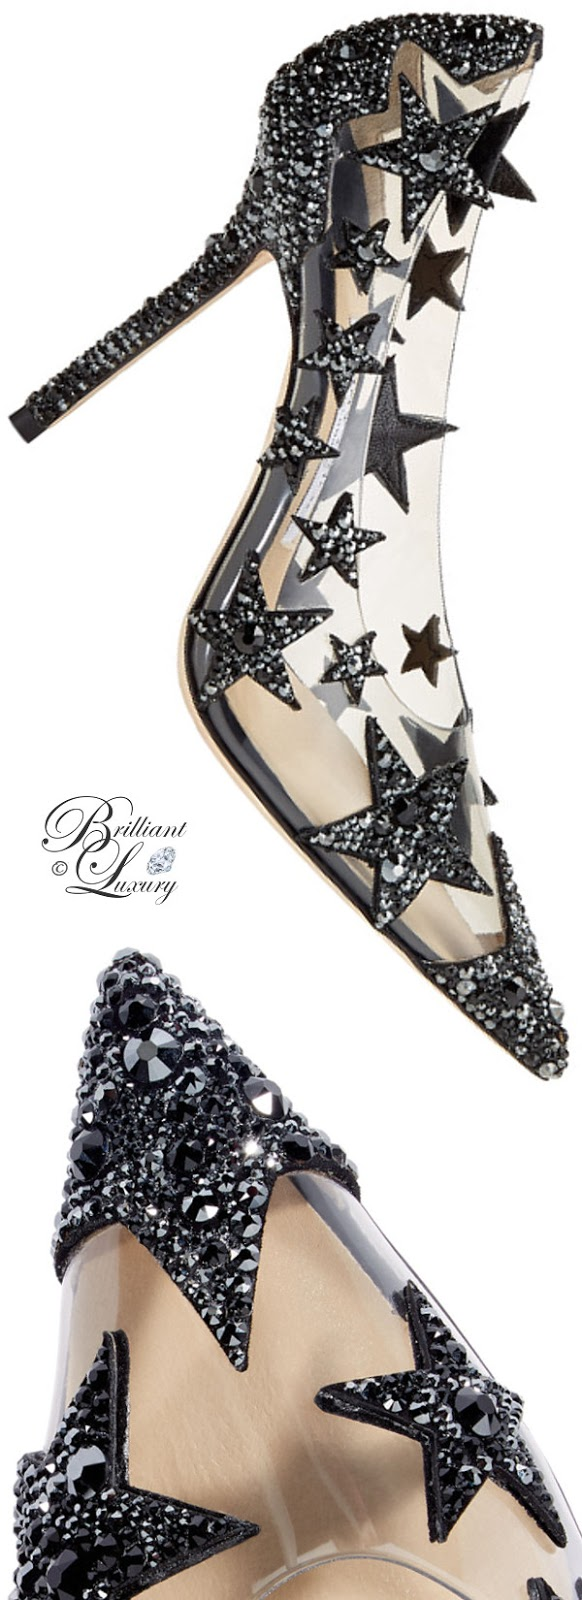 optimized pins Brilliant Luxury ♦ Jimmy Choo Lisha Black and Smoke Mix Plexi Star Patchwork Pointy Toe Pumps with Crystals #brilliantluxury